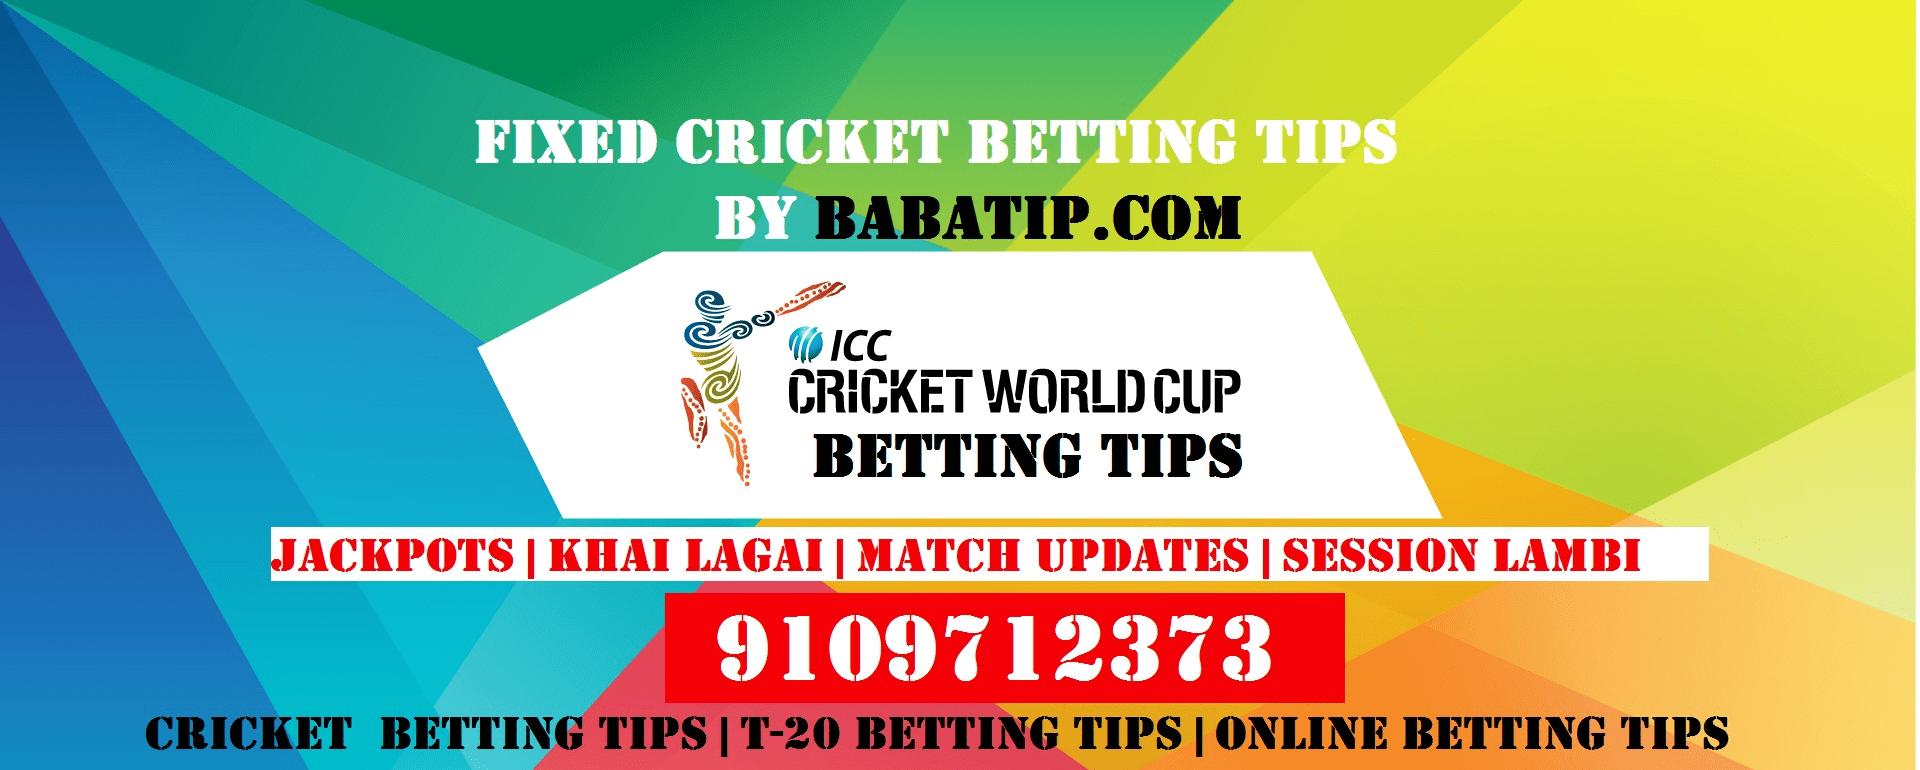 Cricket betting tips blast livelinks betting trends